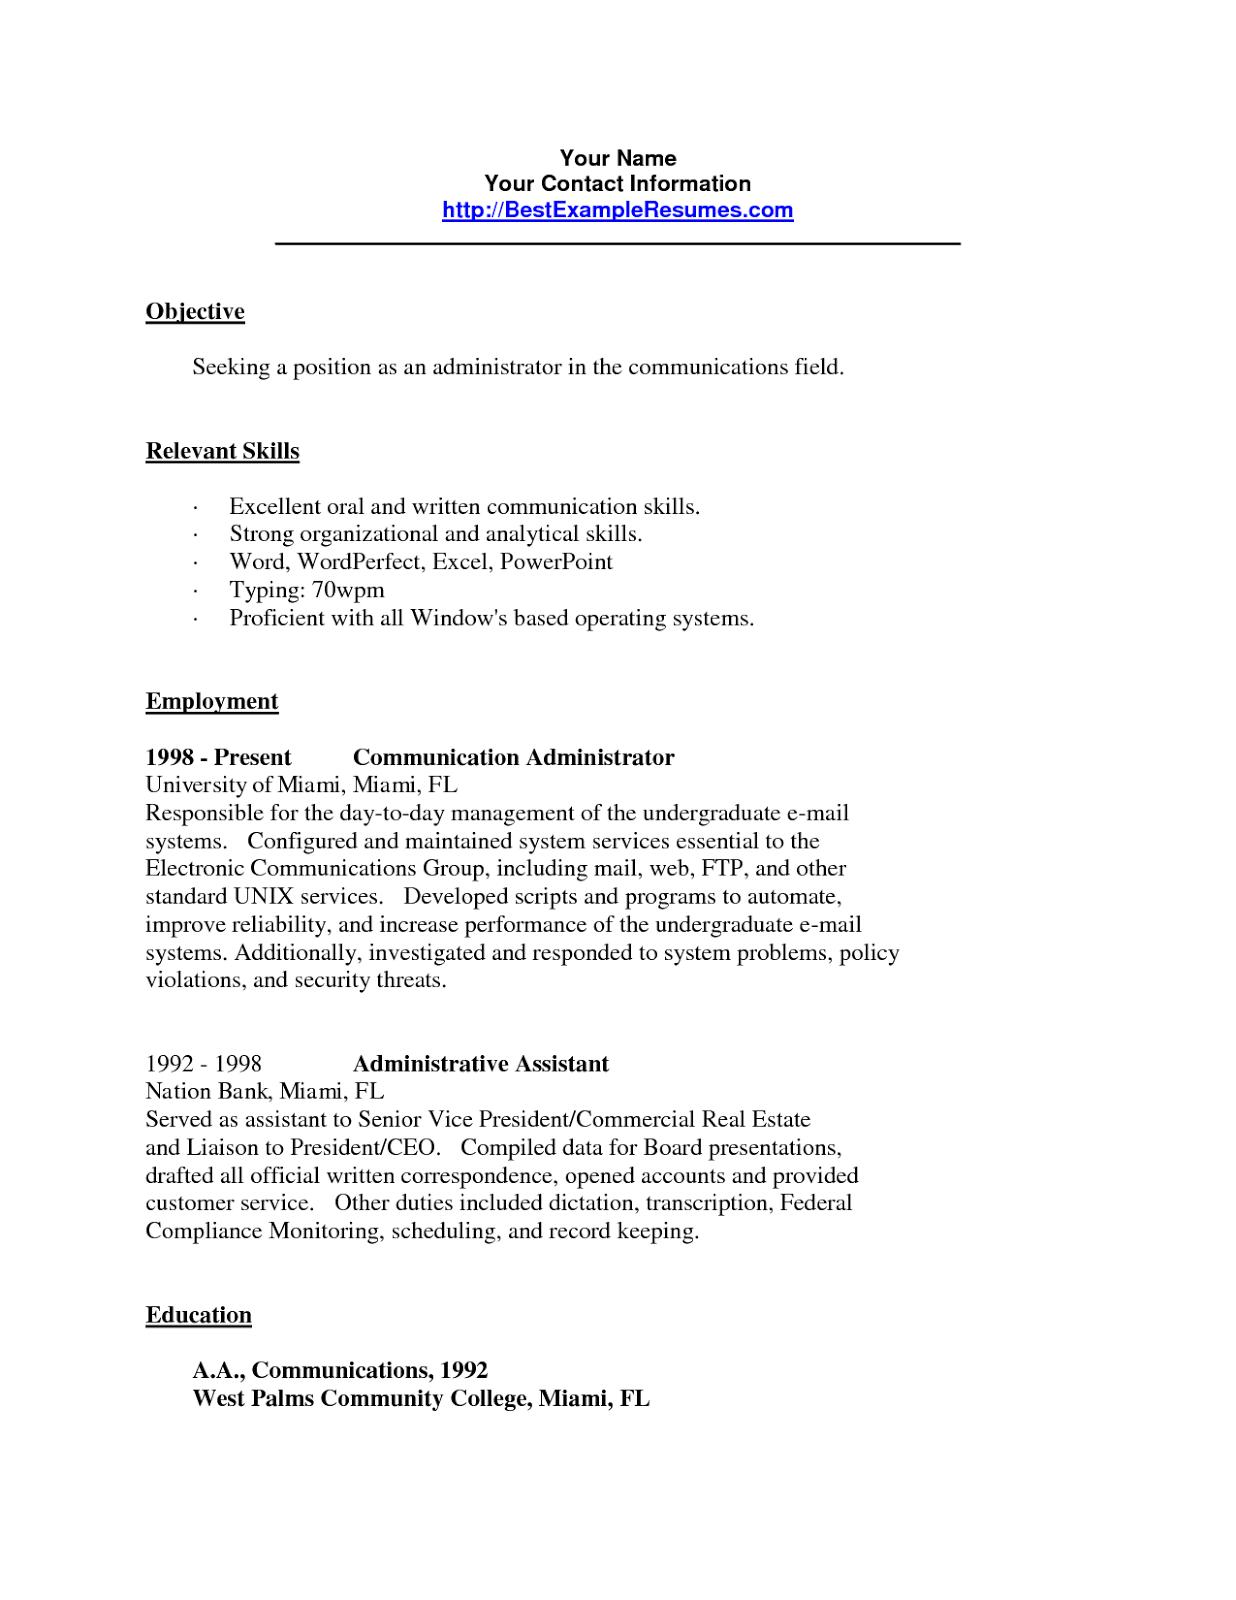 Resume Communication Skills Resume Skills Based Examples Sample  Home Design Idea  Pinterest .